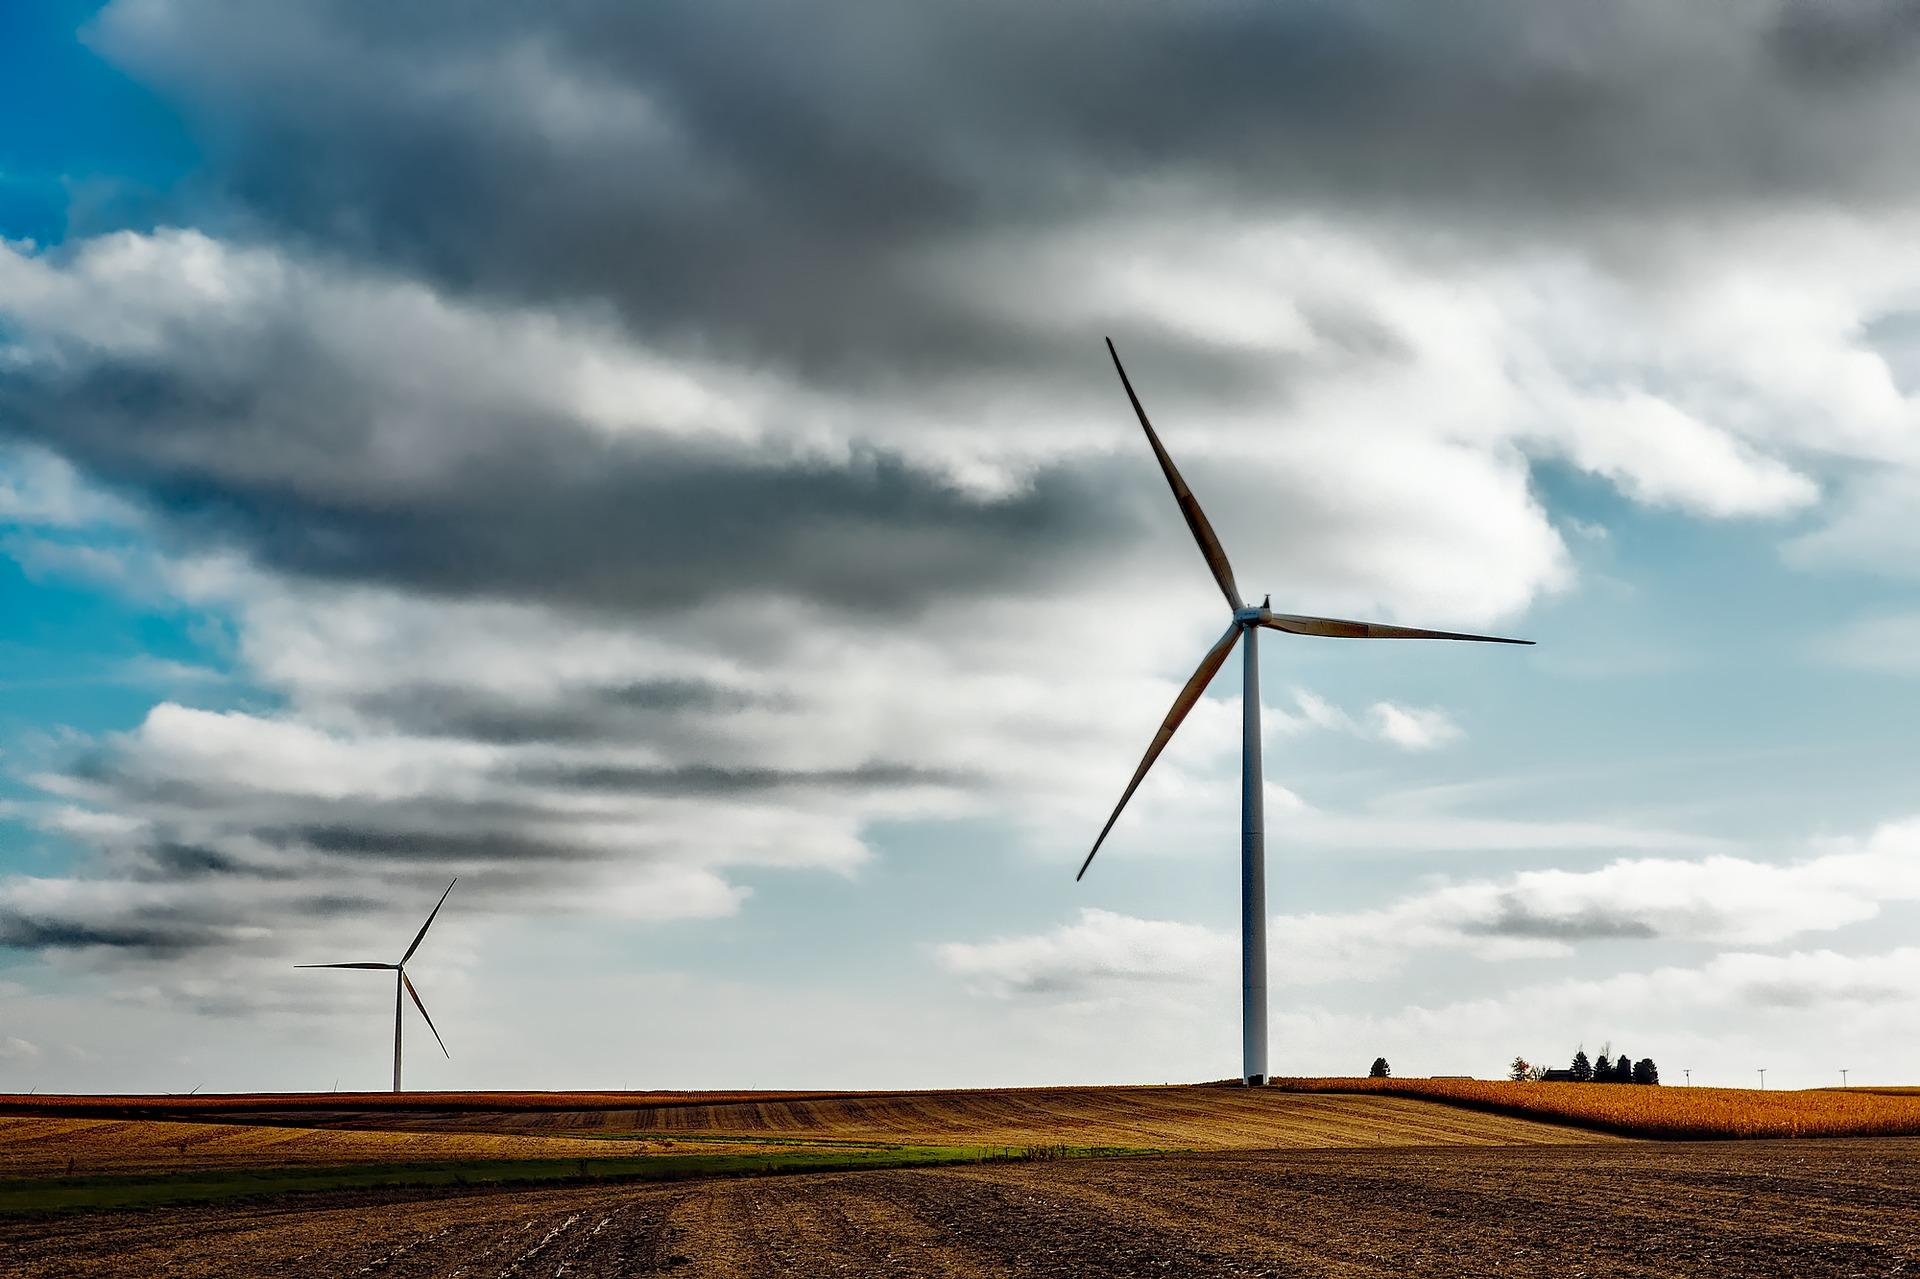 Windräder erzeugen alternative Energie ohne CO2 gegen den Klimawandel.